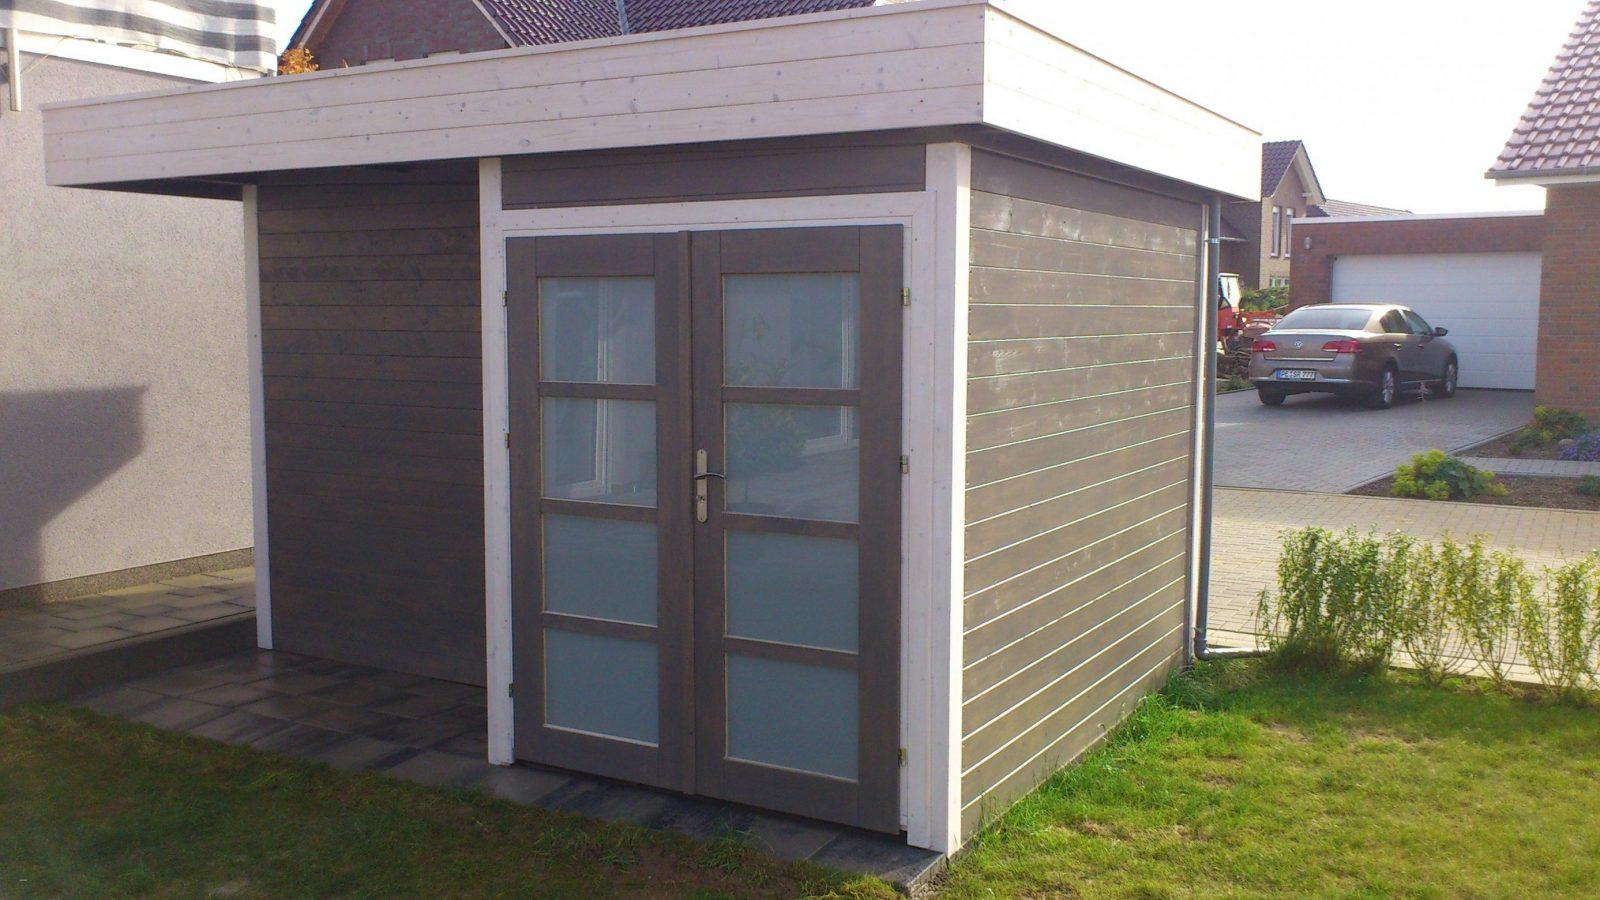 Geräteschuppen Mit Pultdach Inspirierend Gartenhaus Flachdach Selber von Gartenhaus Modern Selber Bauen Bild